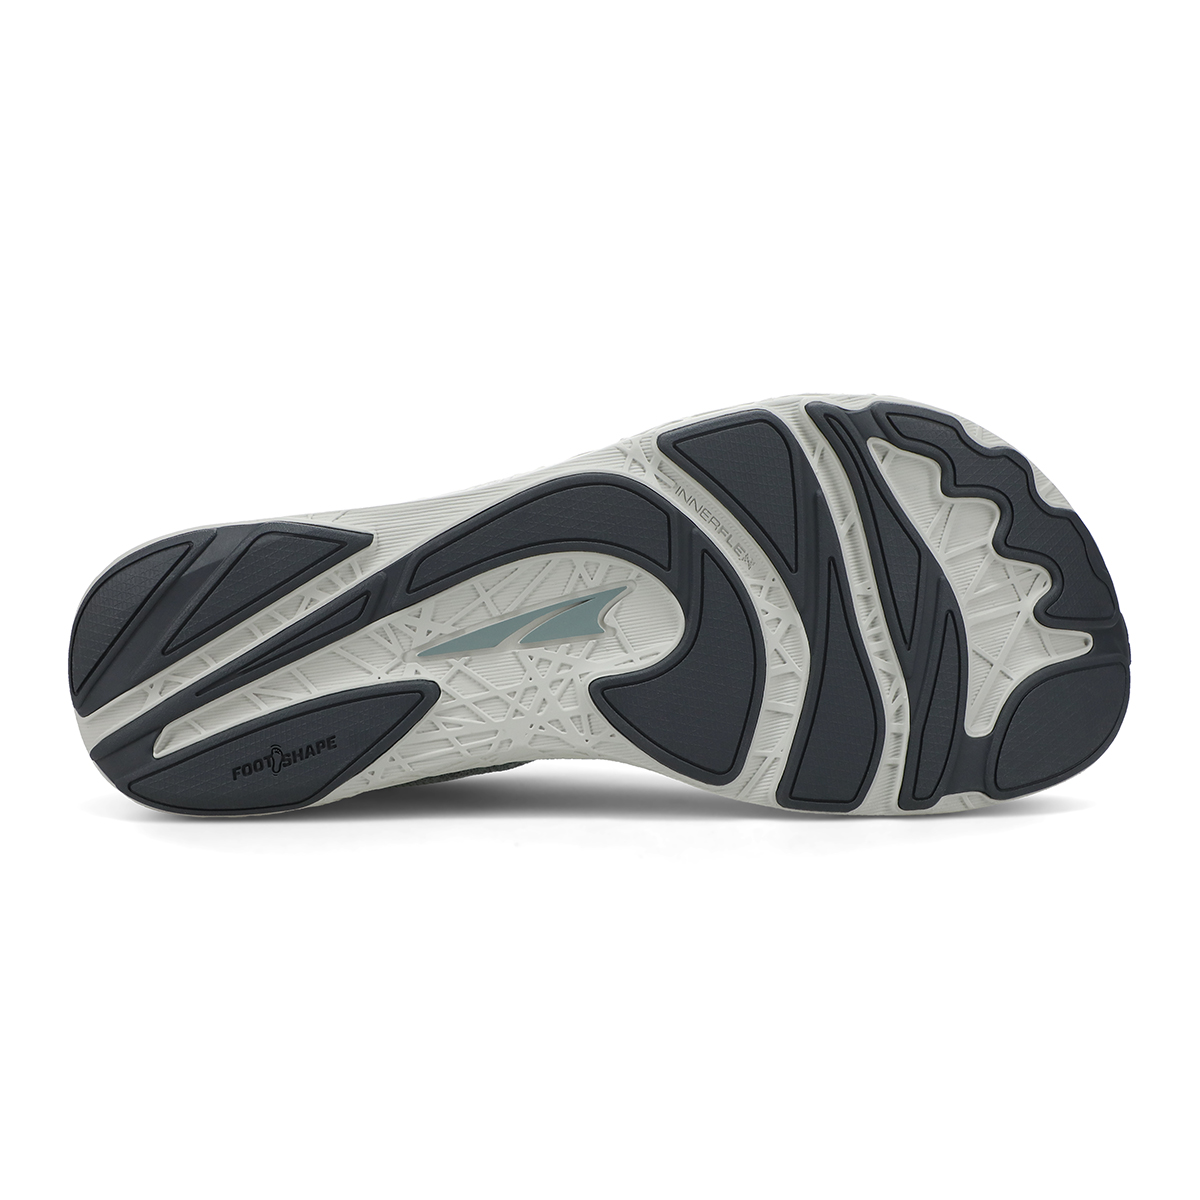 Men's Altra Escalante 2.5 Running Shoe - Color: Dark Slate - Size: 7 - Width: Regular, Dark Slate, large, image 4